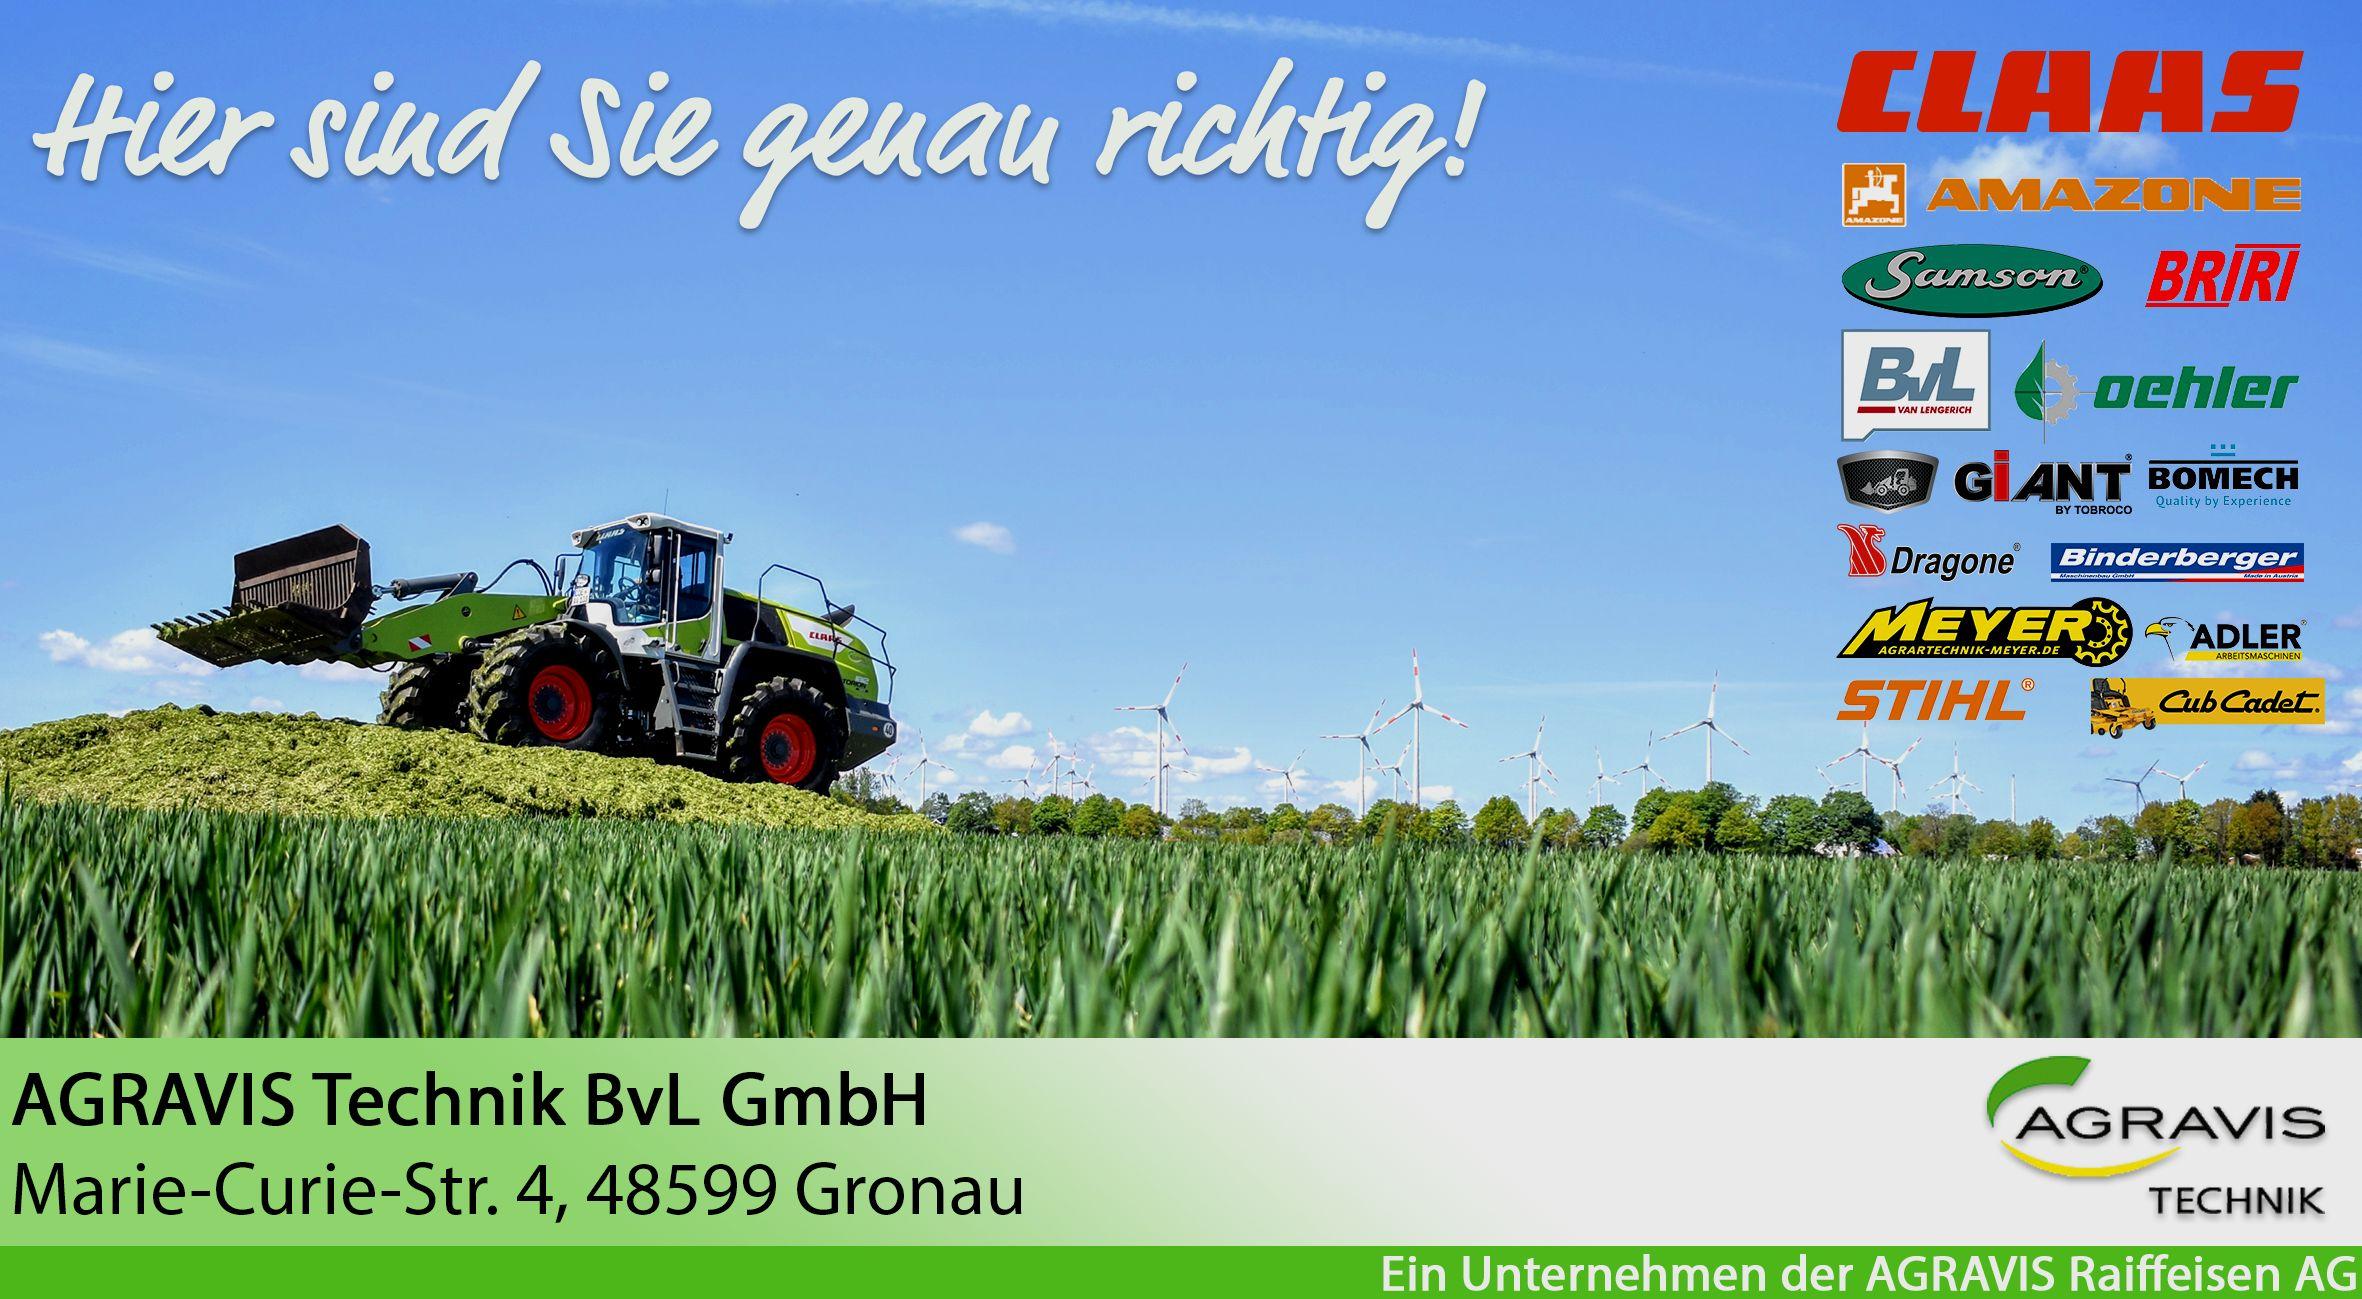 AGRAVIS Technik BvL